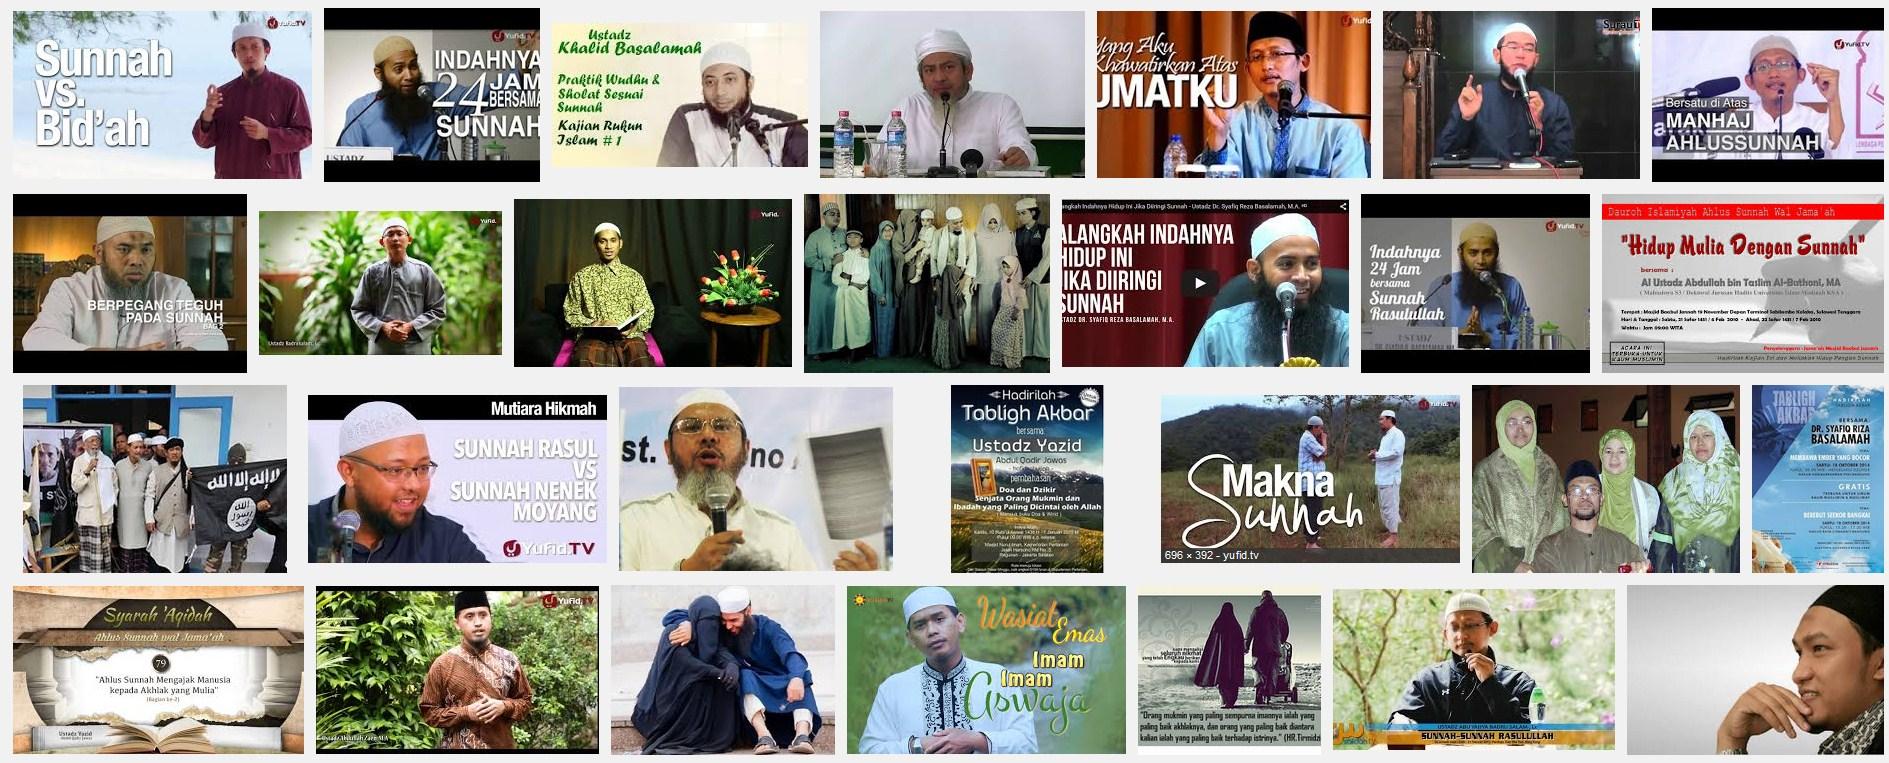 Eko Kusnurhadi Tanya Jawab Kajian Ustadz Sunnah di Youtube